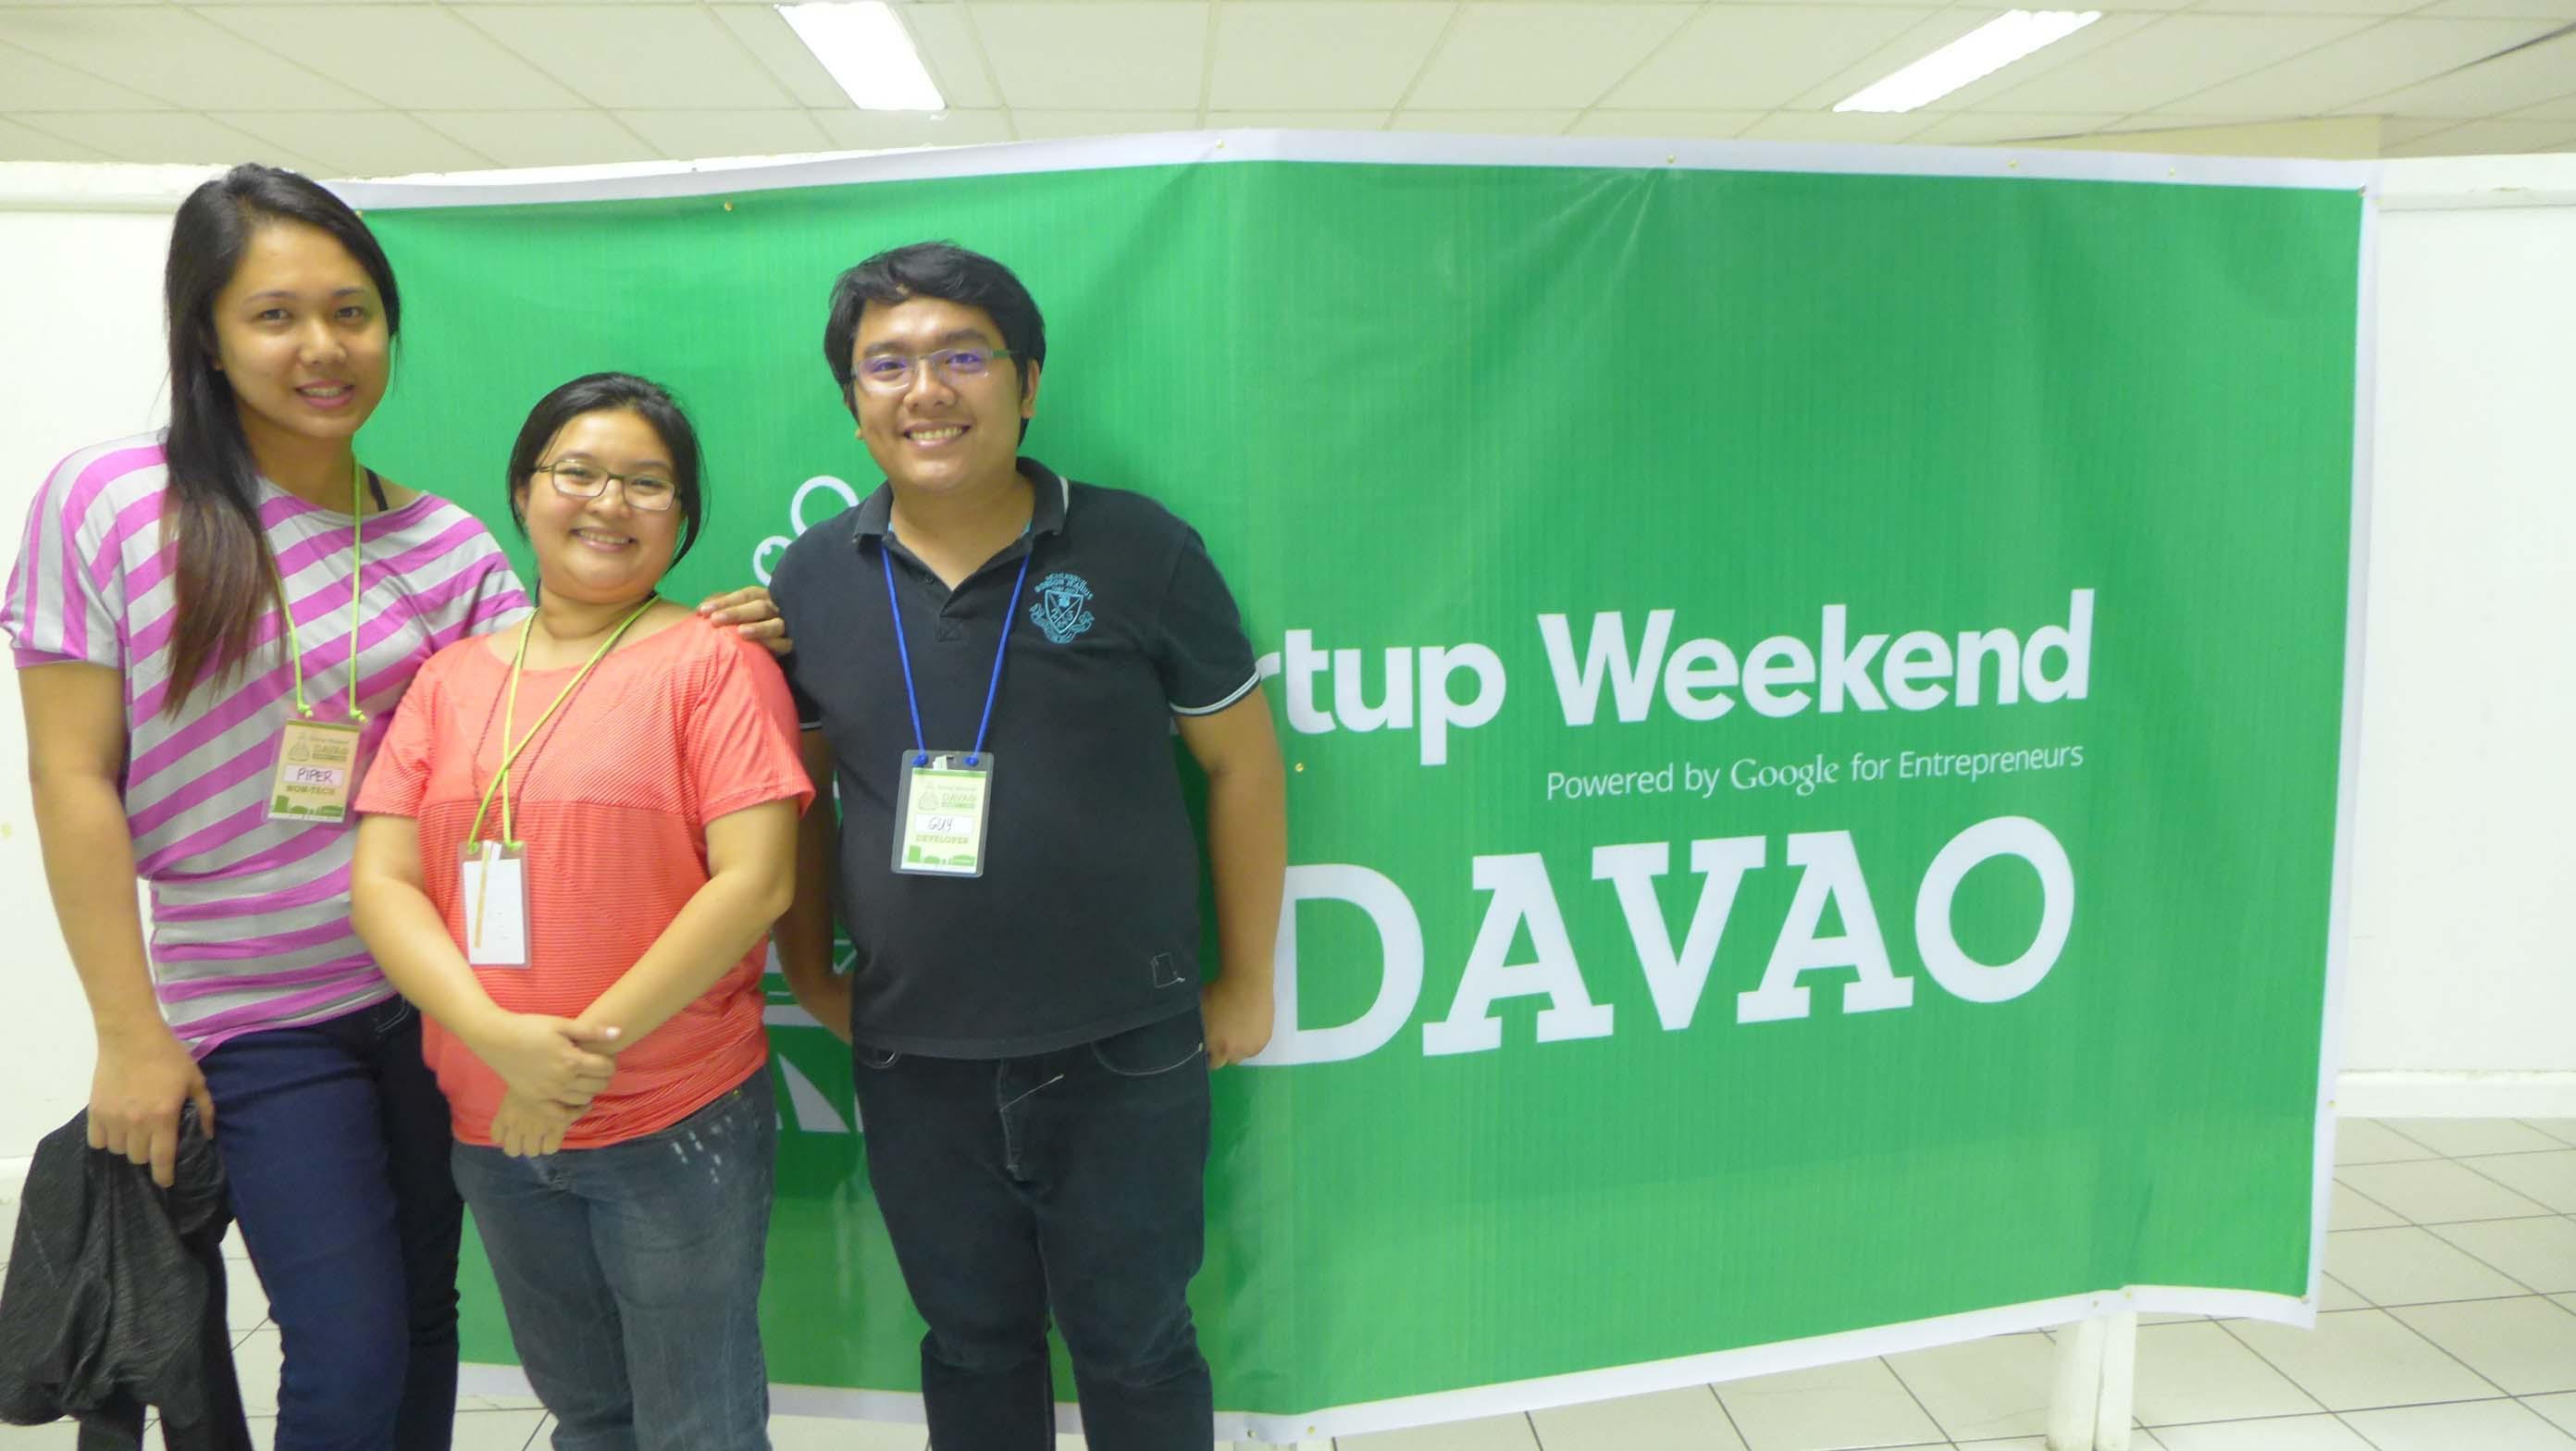 Onlinejobs.ph Jobseekers Participating in StartUp Weekend